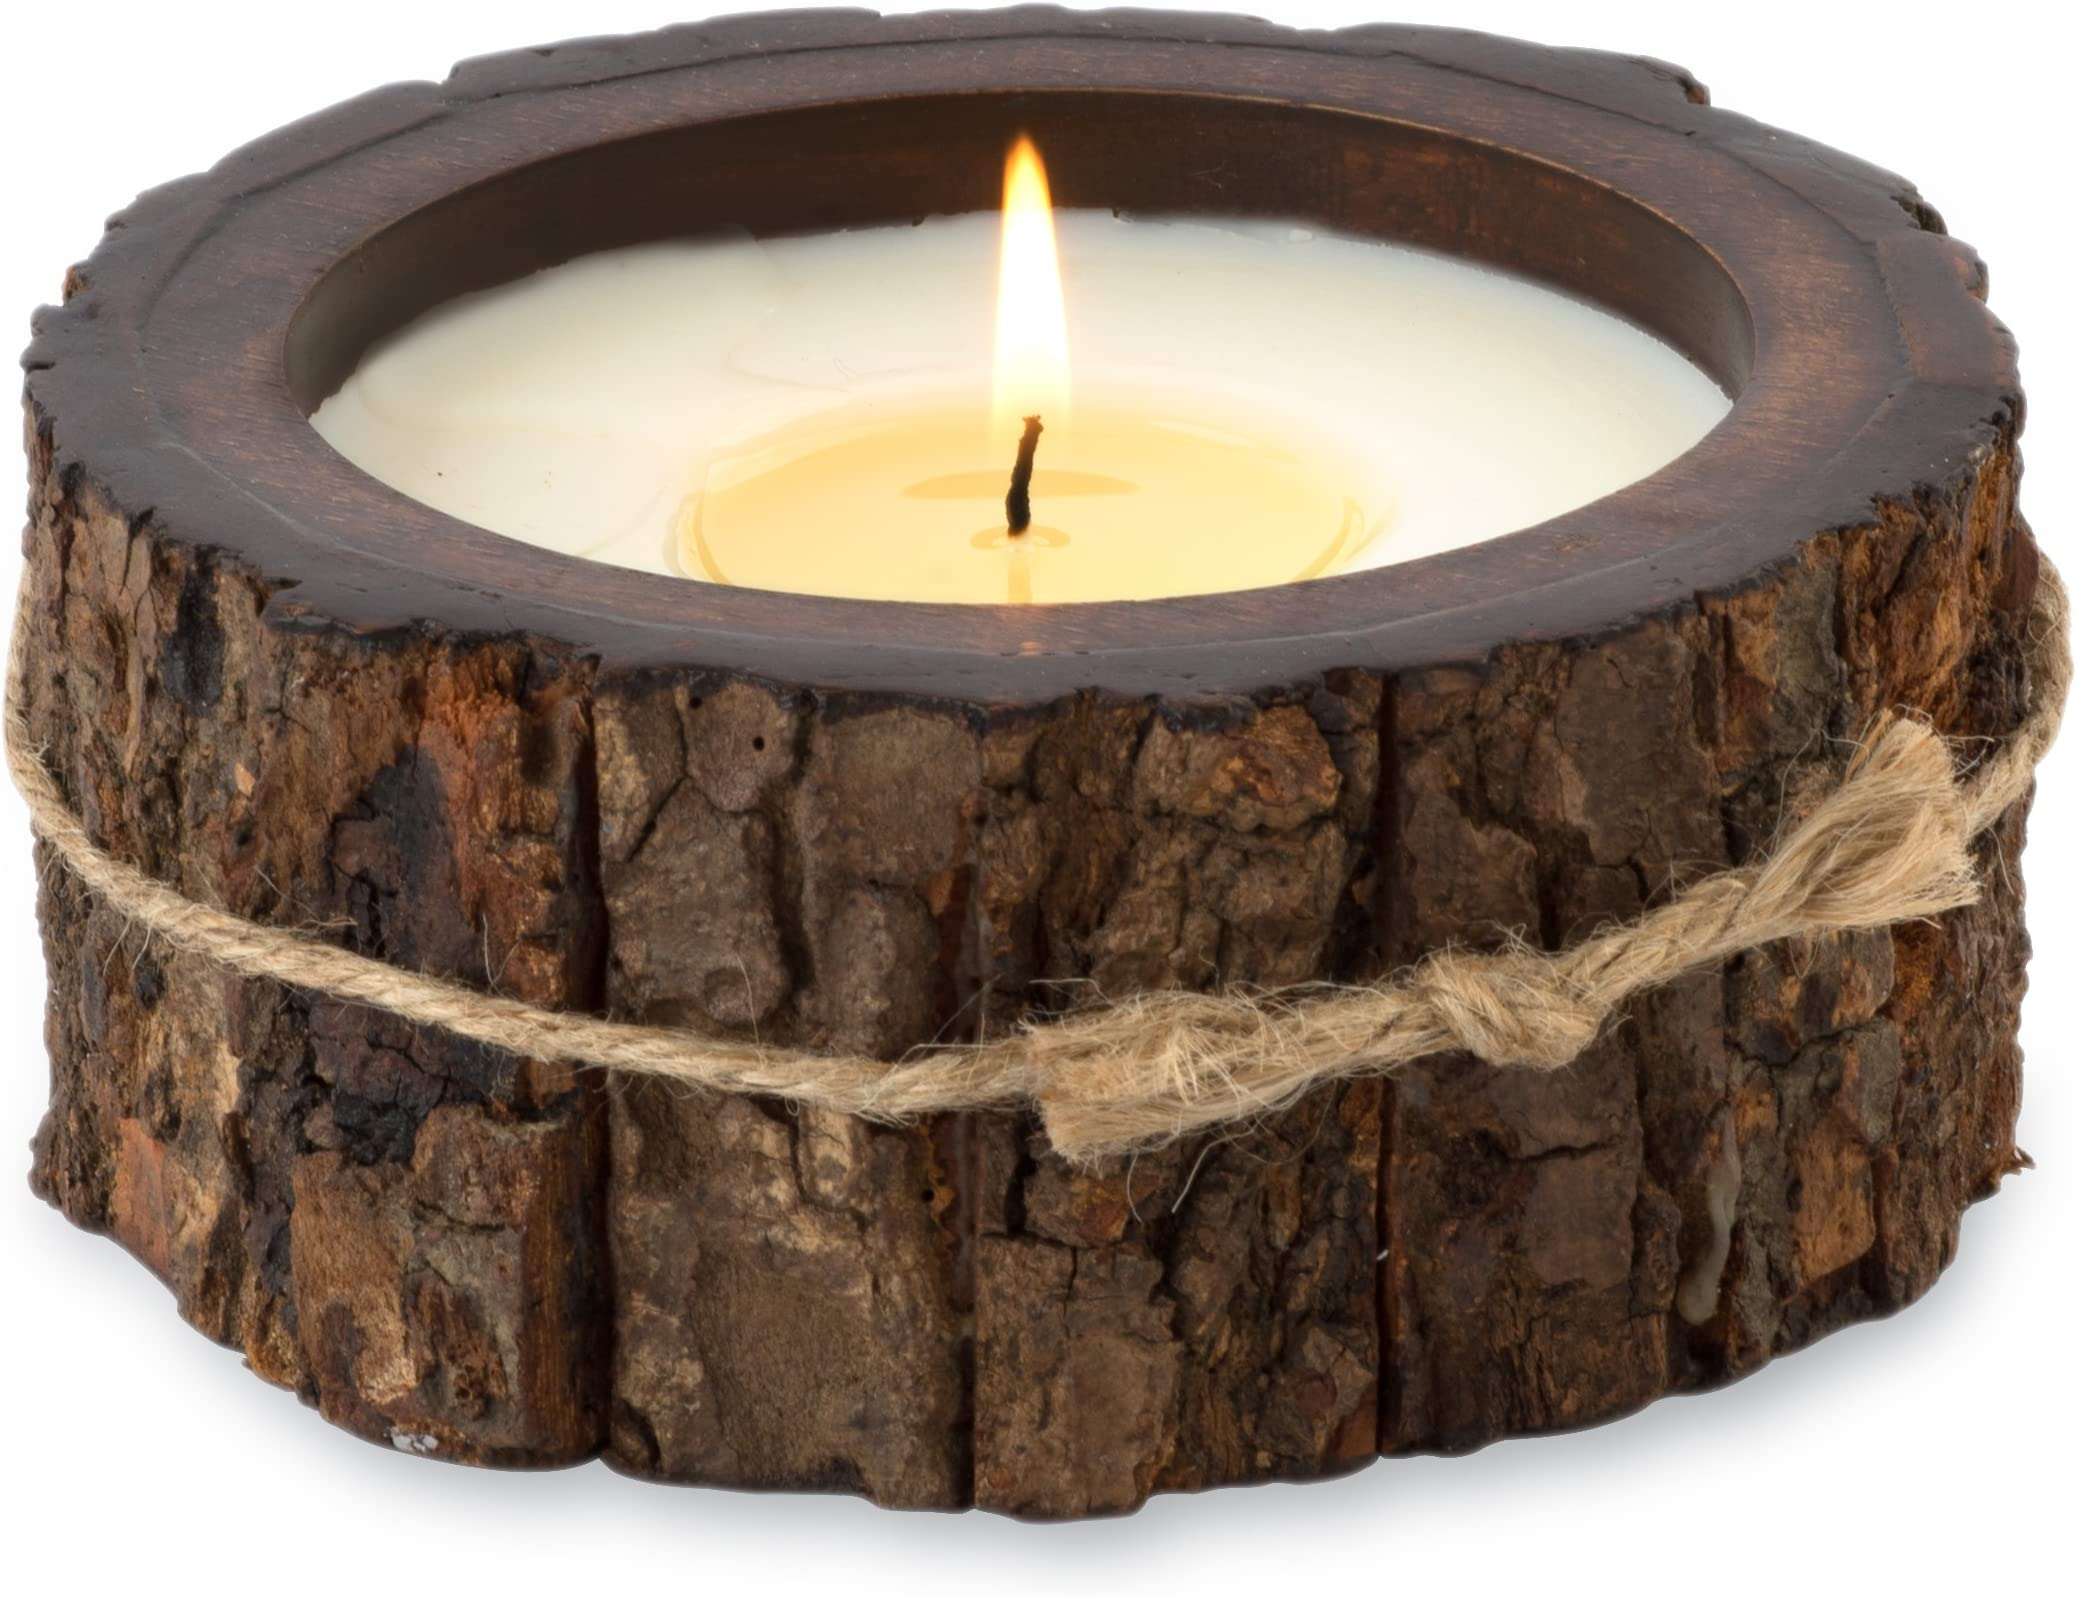 226,8/Gram Ginger Patchouli Himalayan Trading Post Fleur de Lys Soy Candle Tumbler